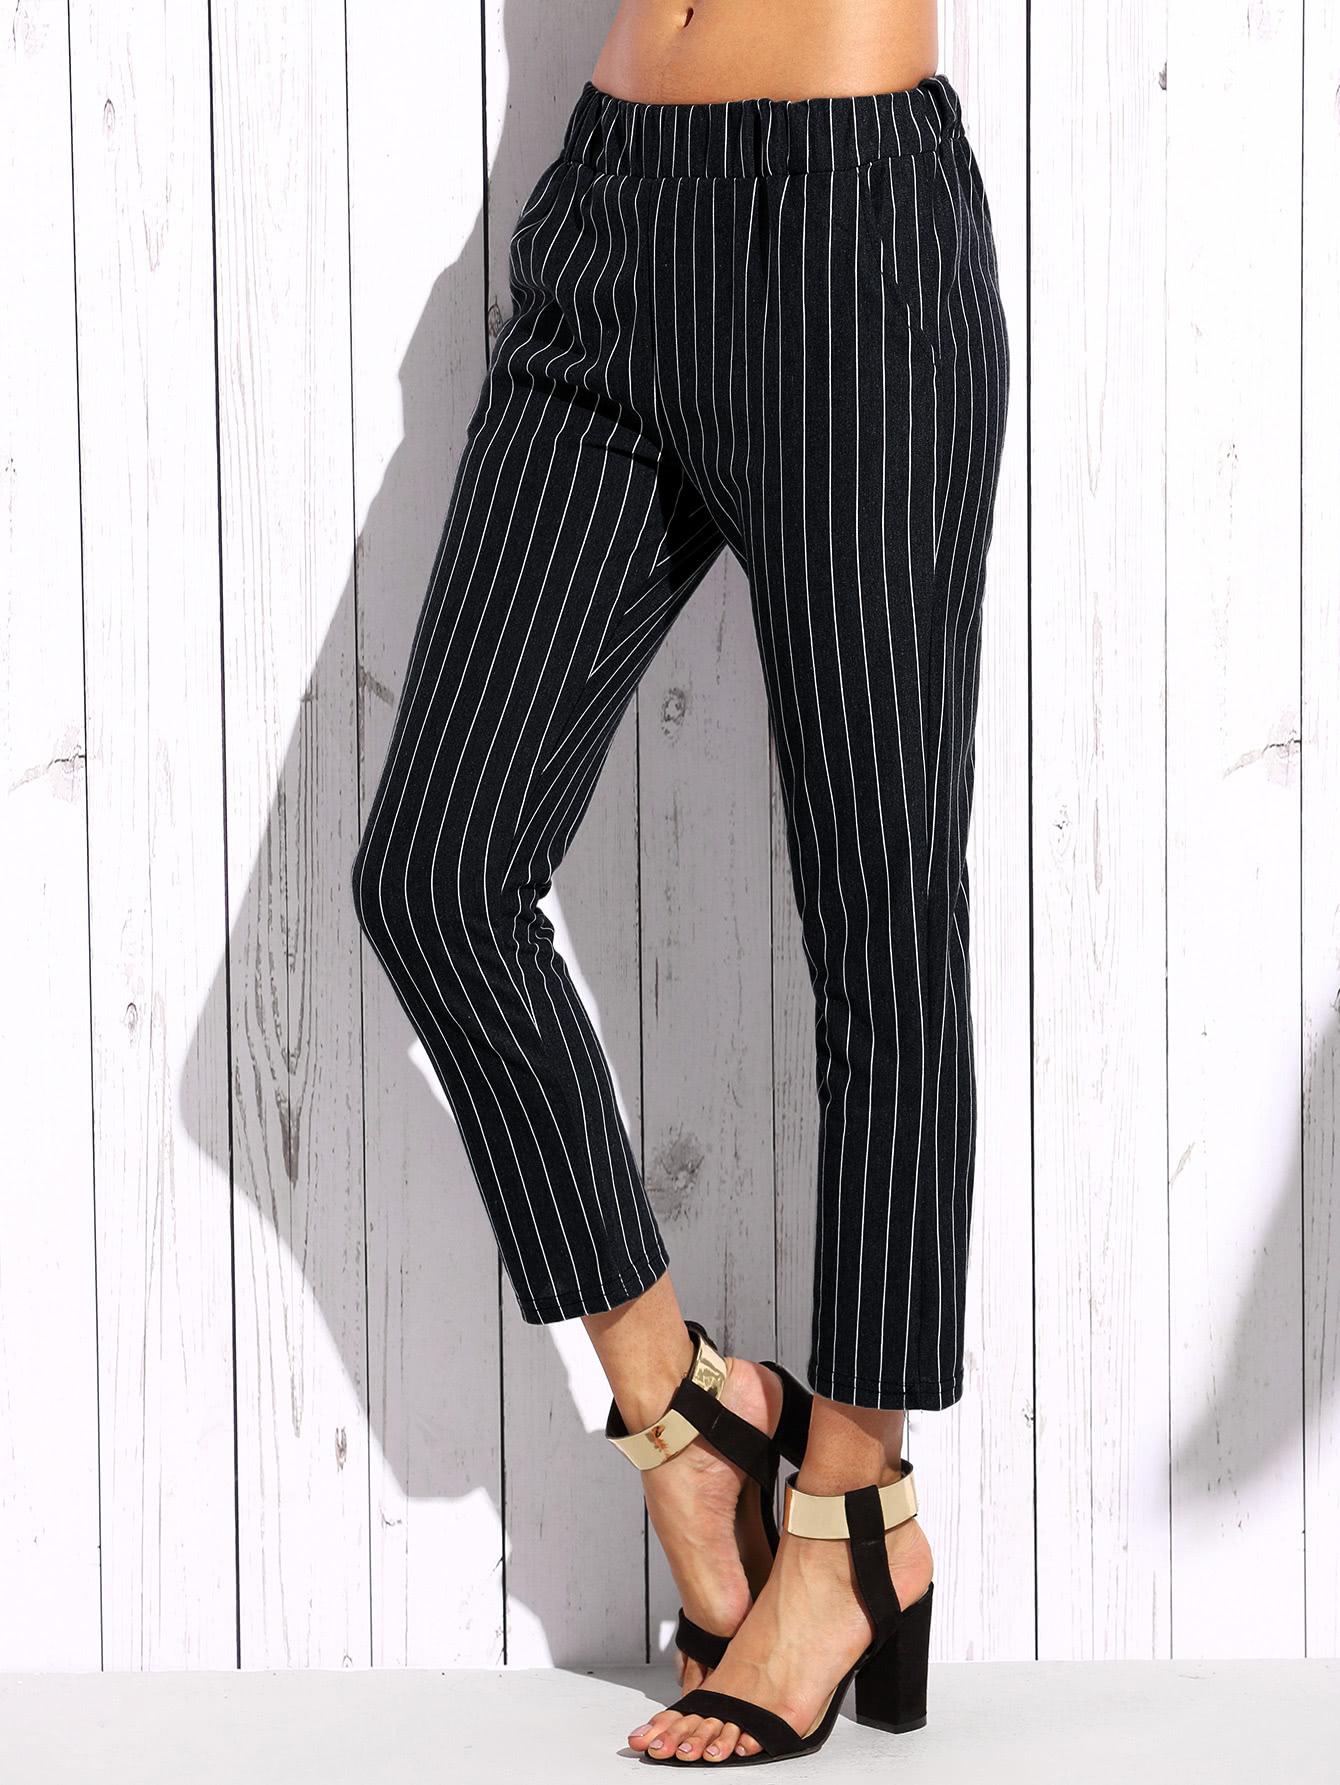 Vertical Striped Elastic Waist Pants